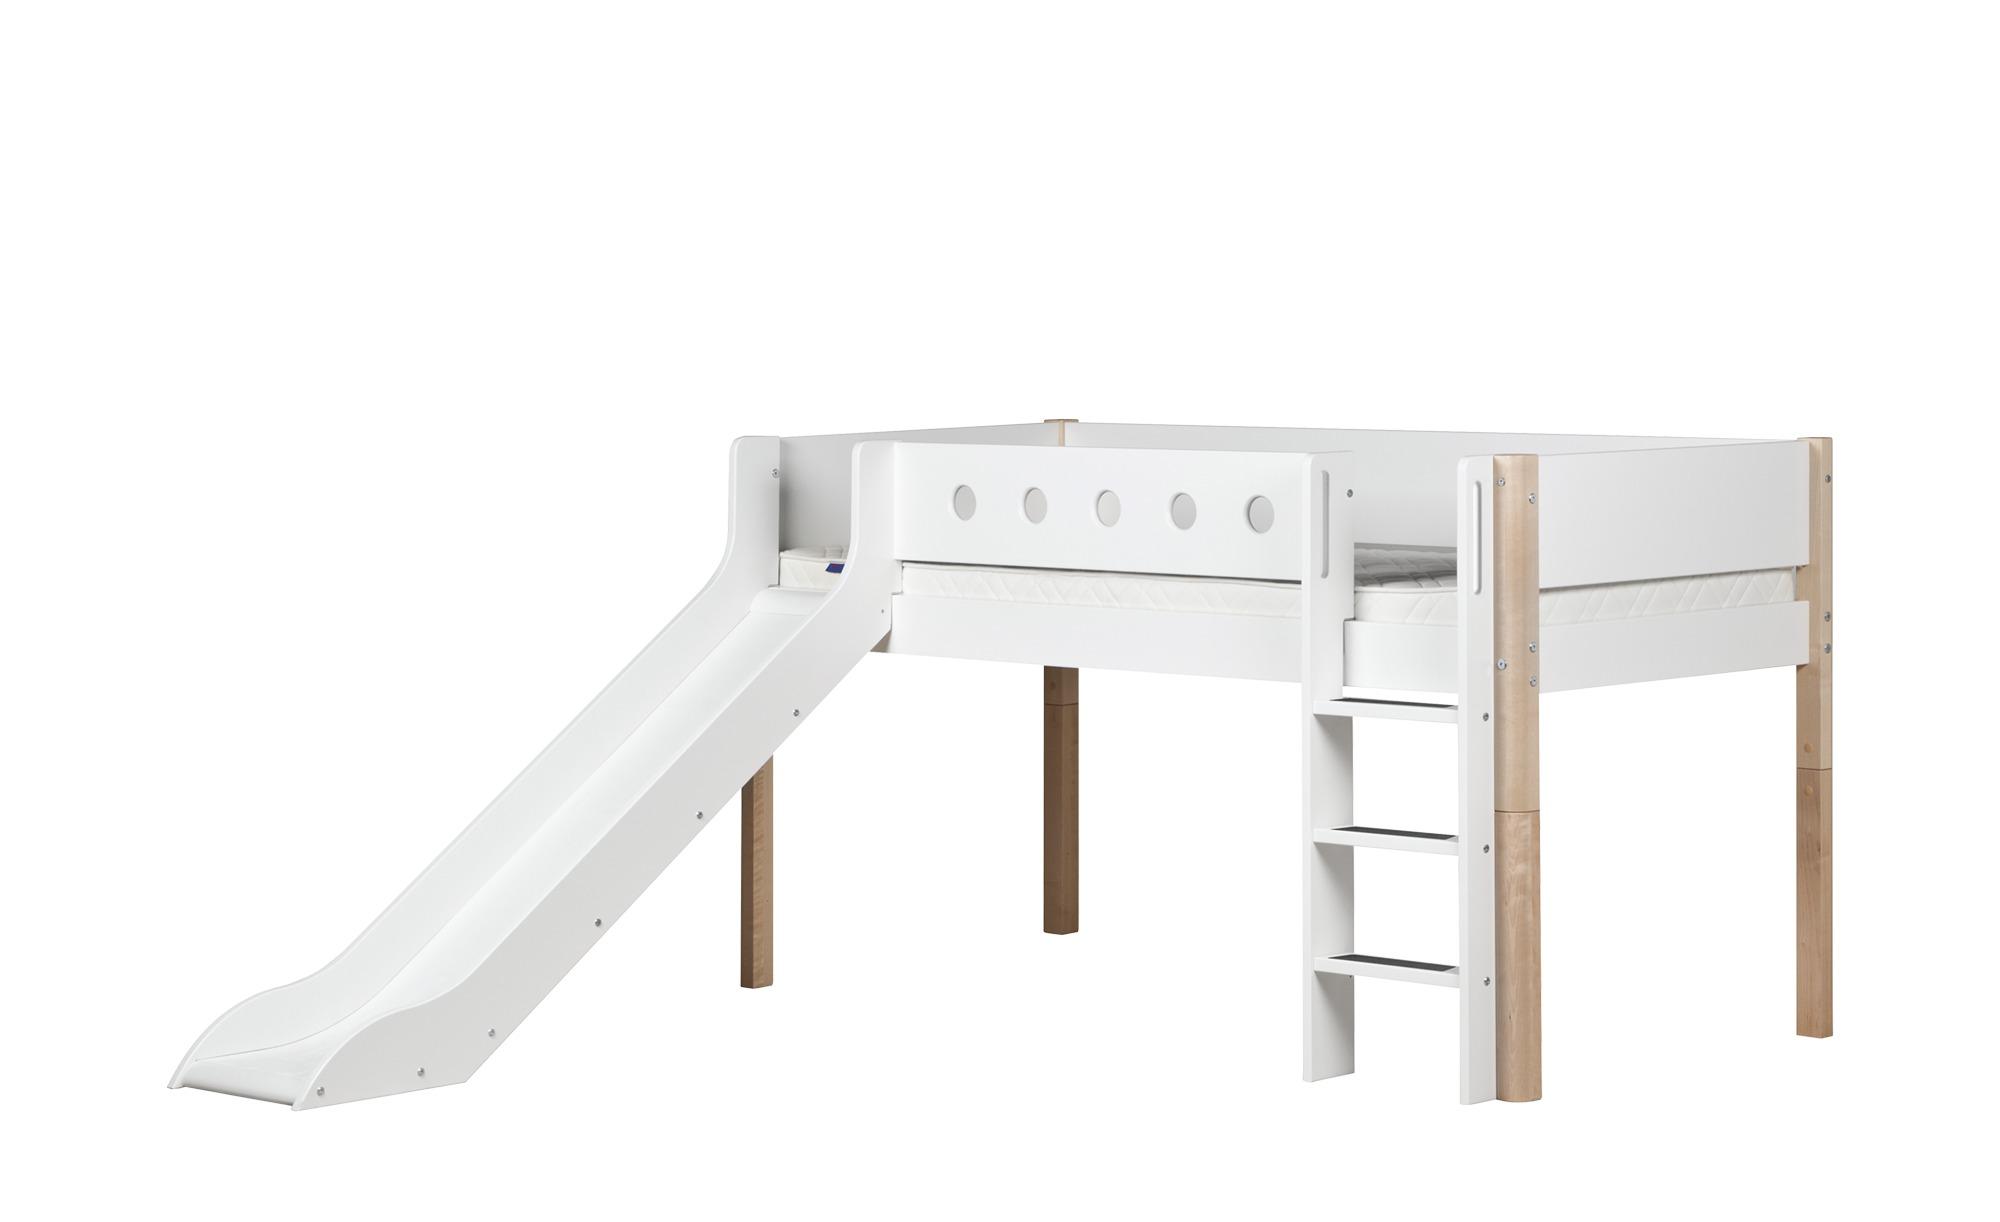 Flexa Halbhohes Bett Mit Rutsche Flexa White Breite 250